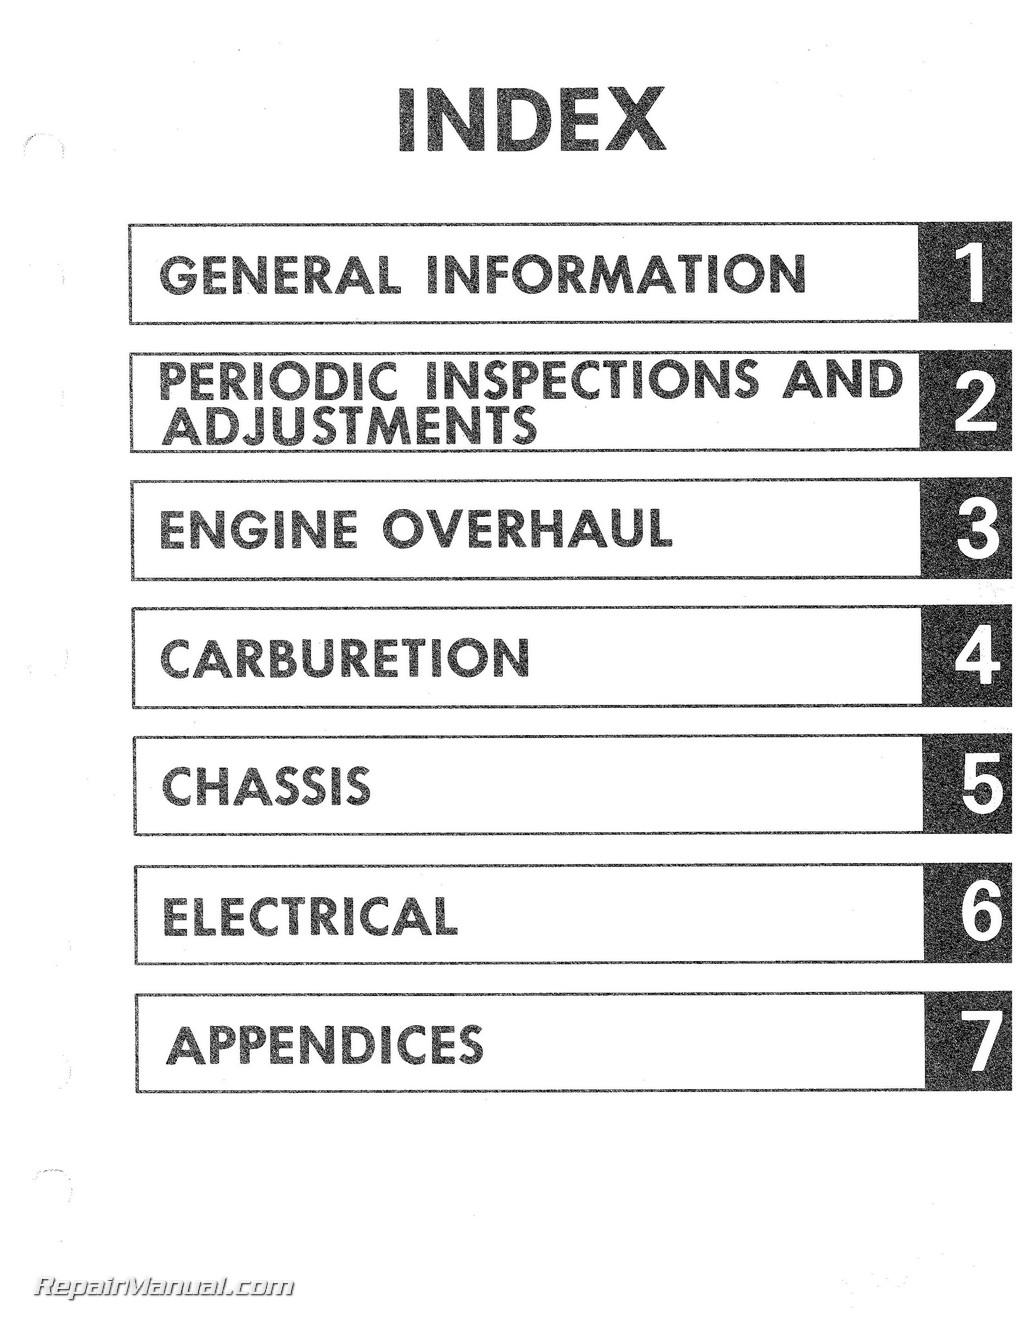 1982 yamaha xt125j xt200j motorcycle service manual rh repairmanual com Vv5fs2 01T1 101 02T Nvfs2120 3DZ 02T